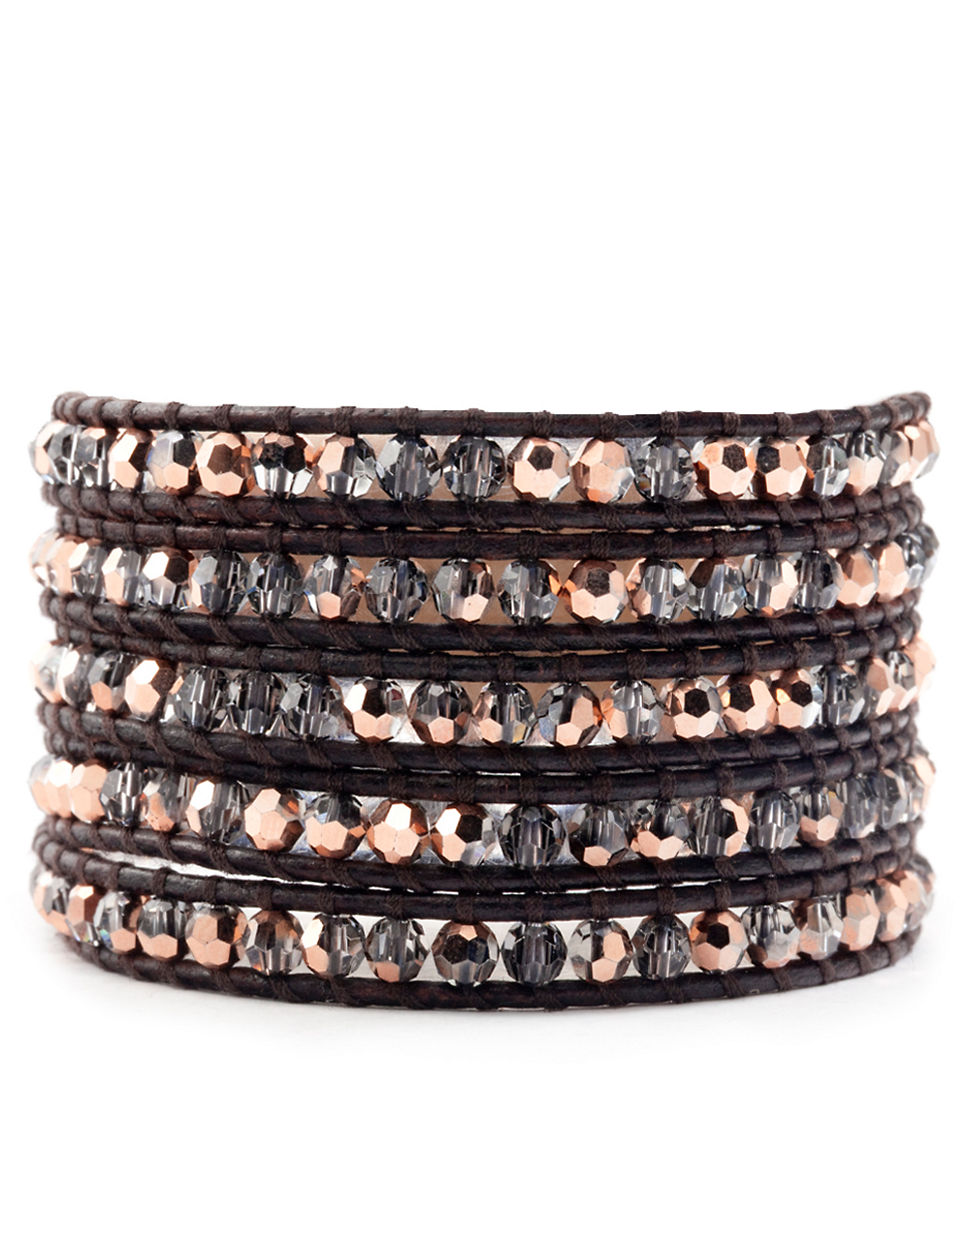 Lyst Chan Luu Swarovski Crystal Leather Wrap Bracelet In